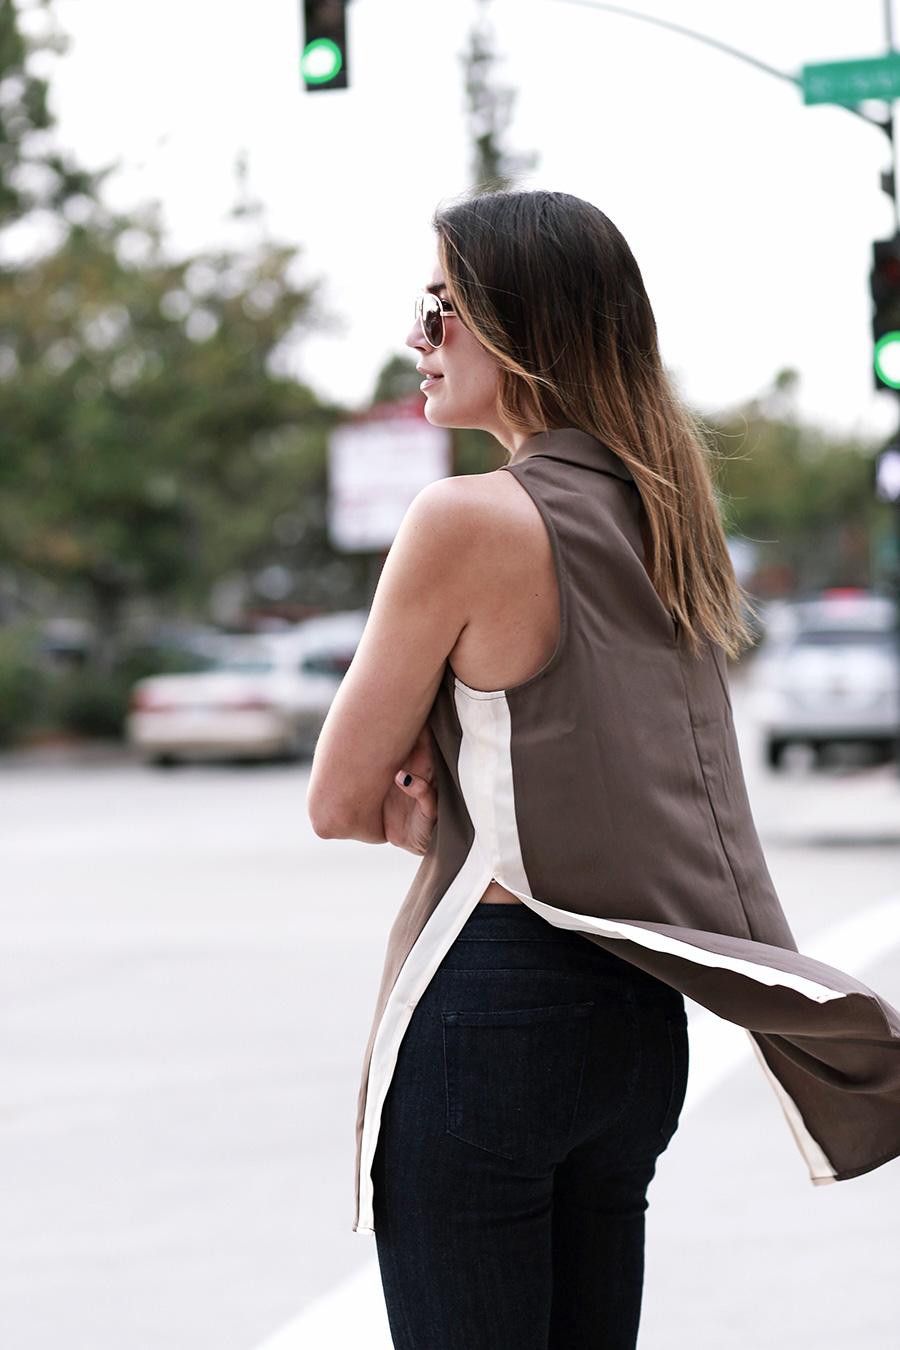 forever21 side slit tunic forever21 denim white heels thrifts and threads  9